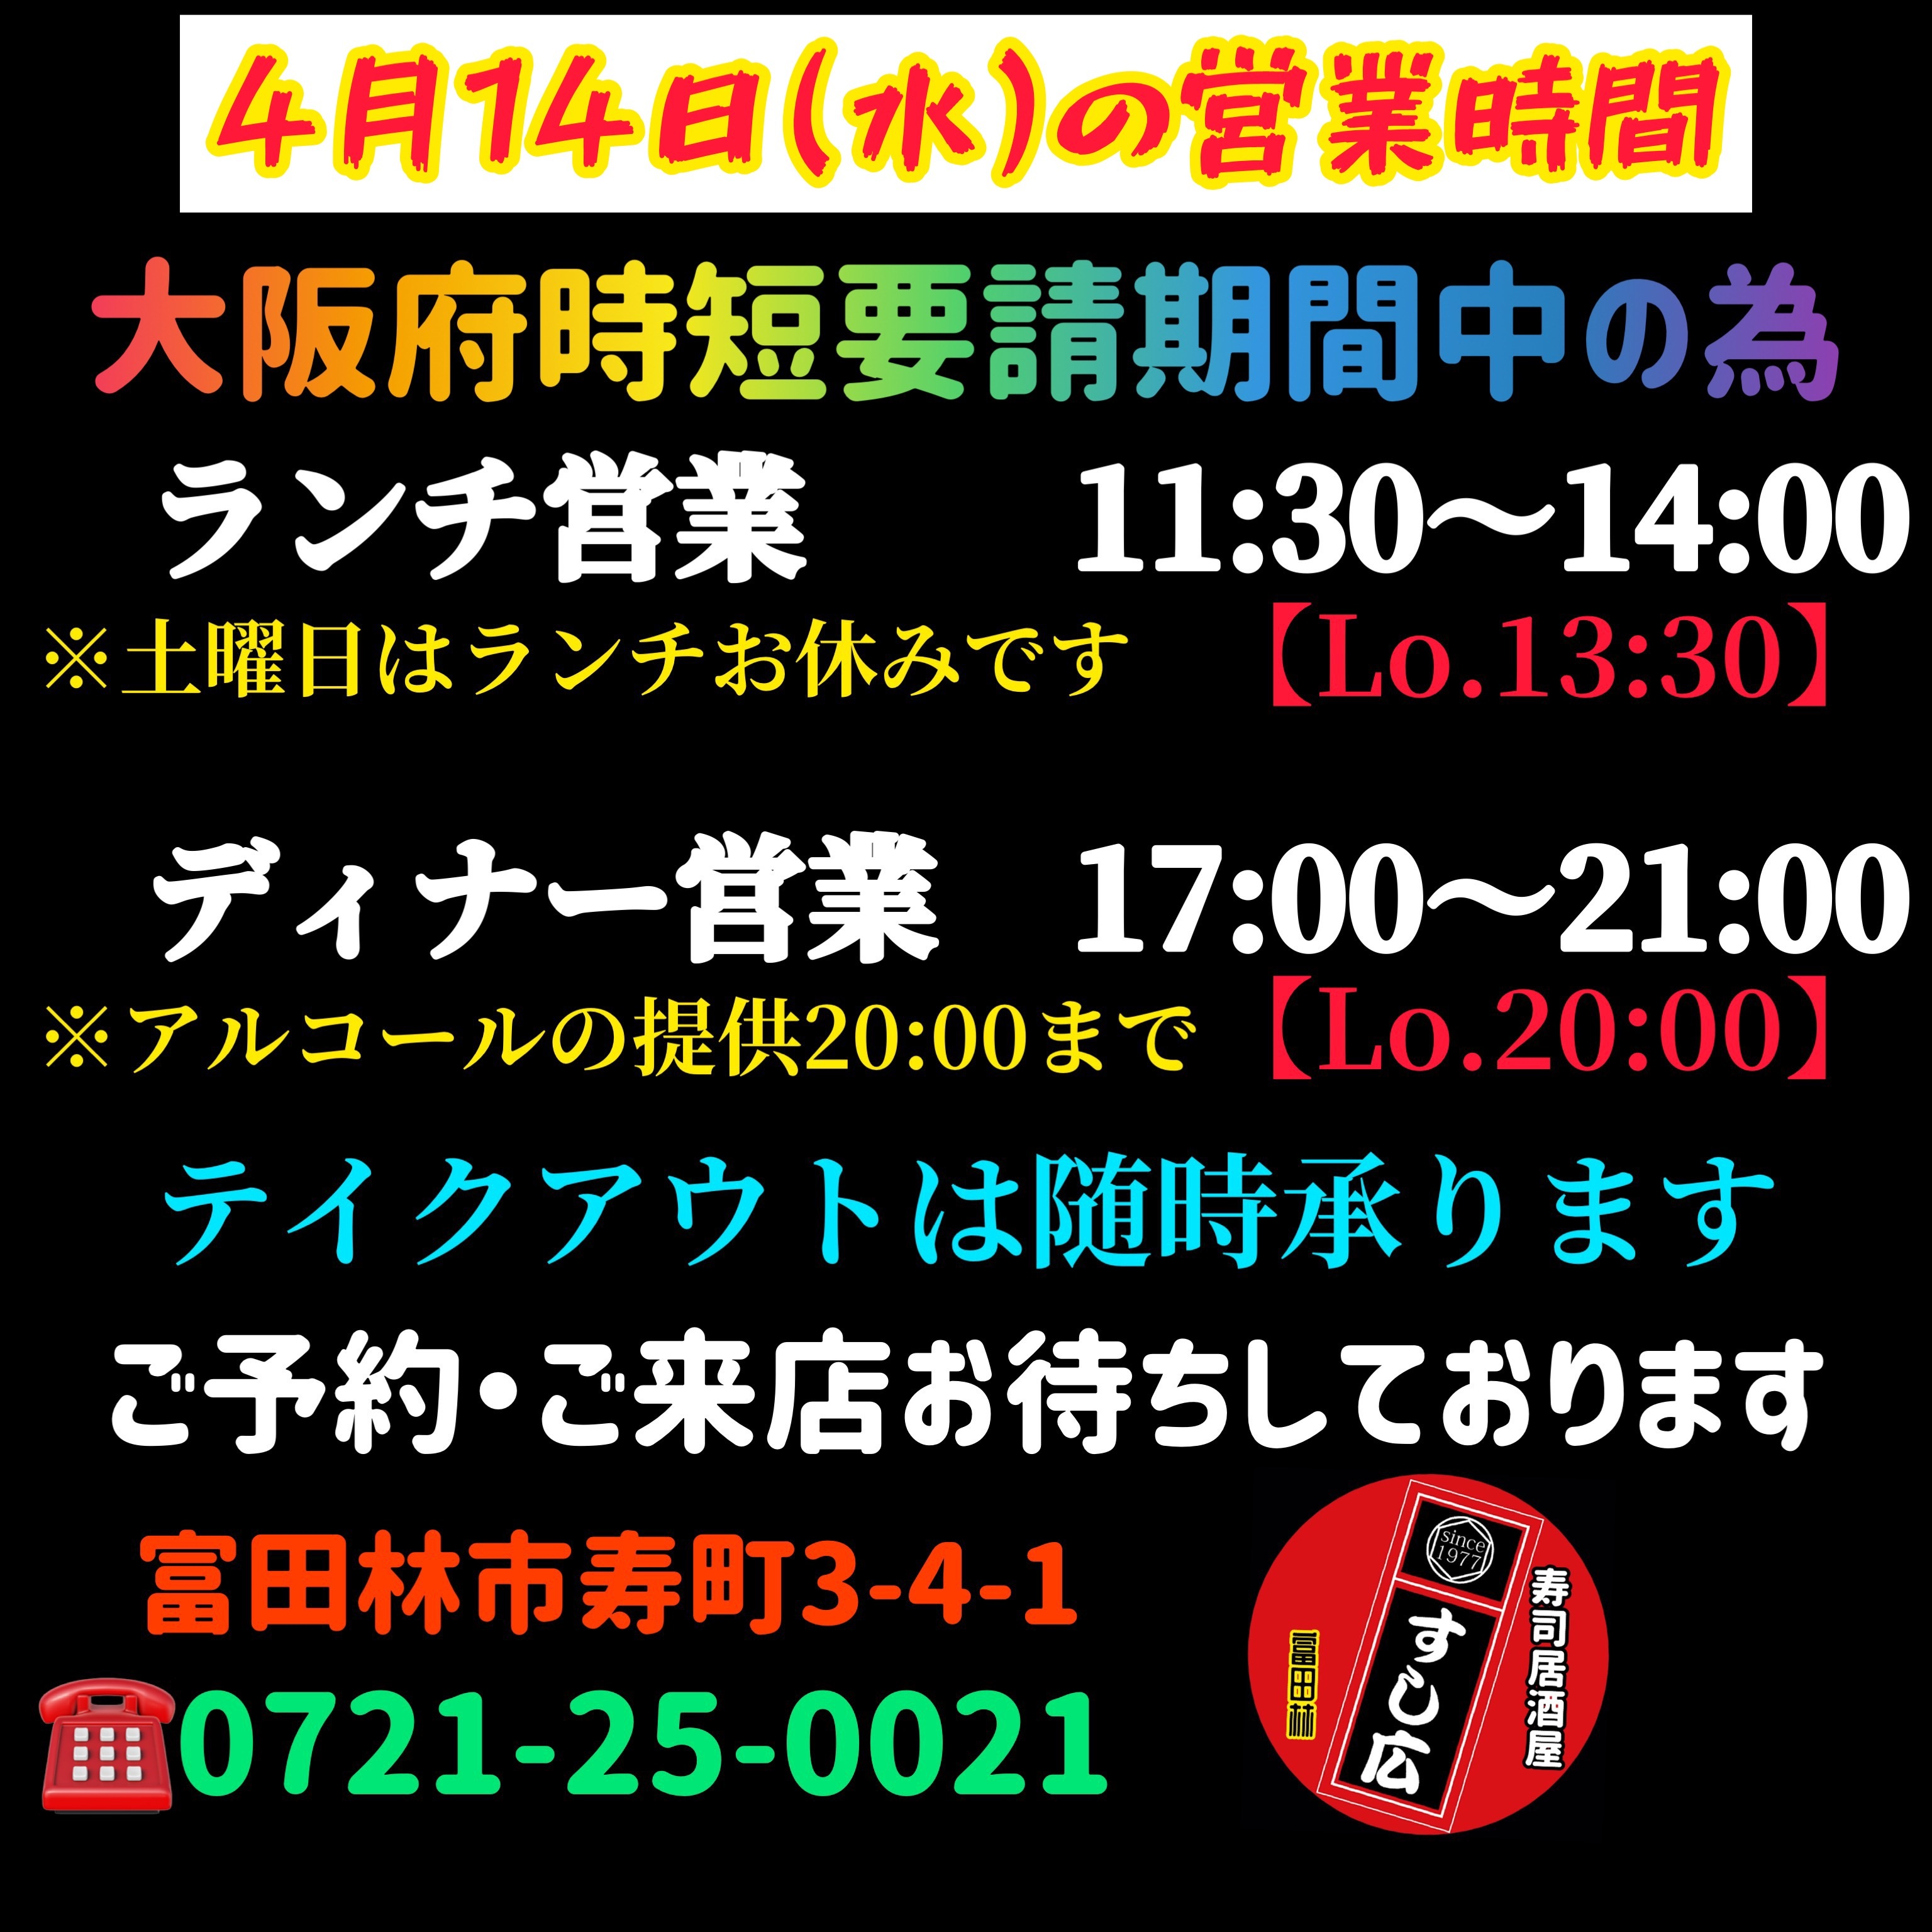 f:id:carp_0301_kenta:20210414073112j:image